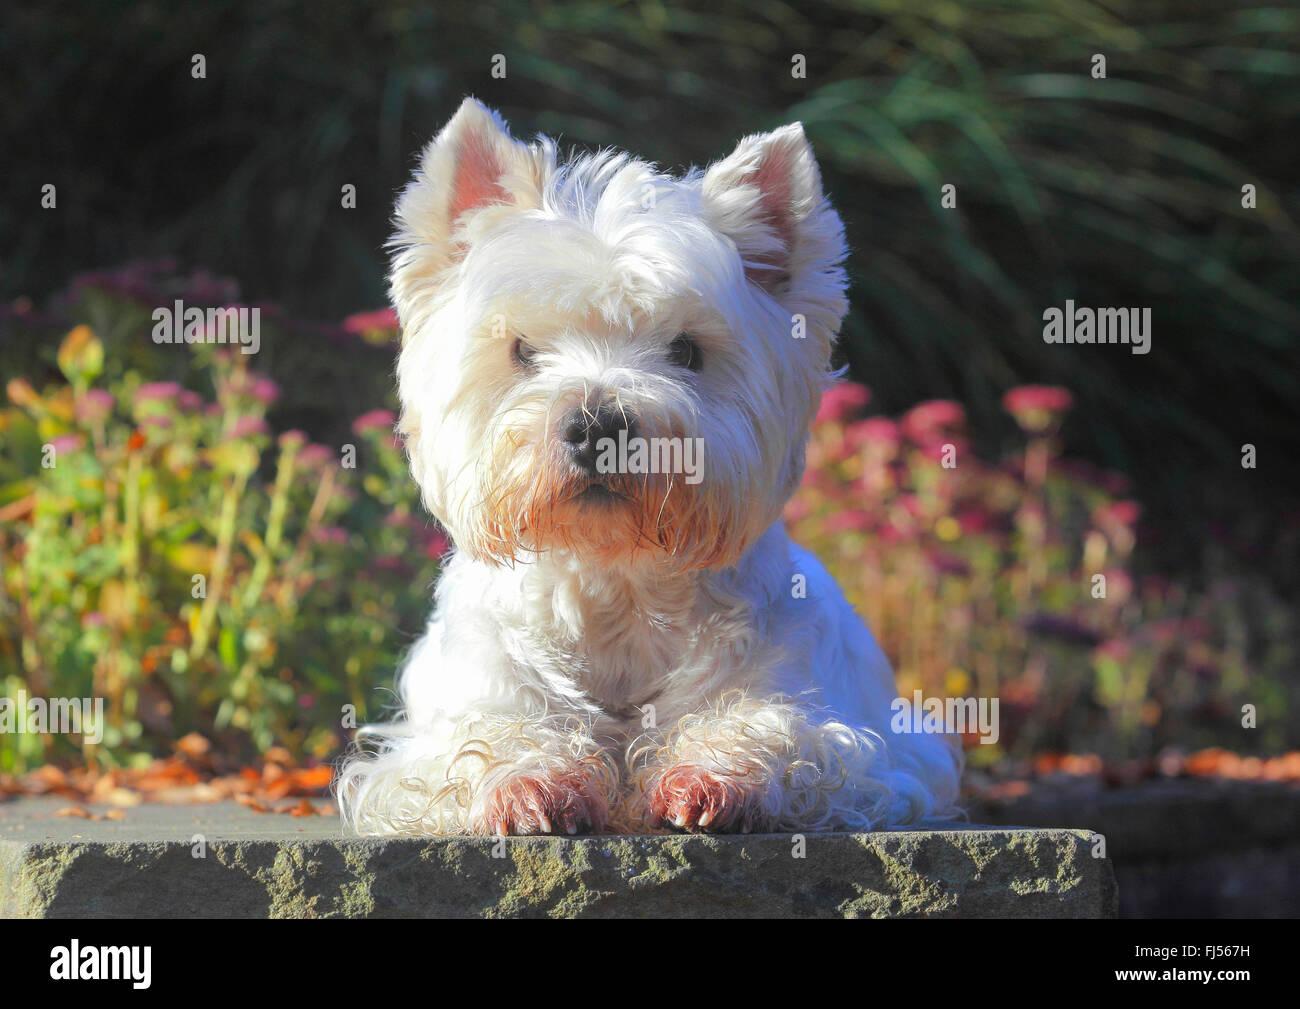 West Highland White Terrier, Westie (Canis lupus f. familiaris), nove anni vecchio cane maschio giacente in un parco Foto Stock